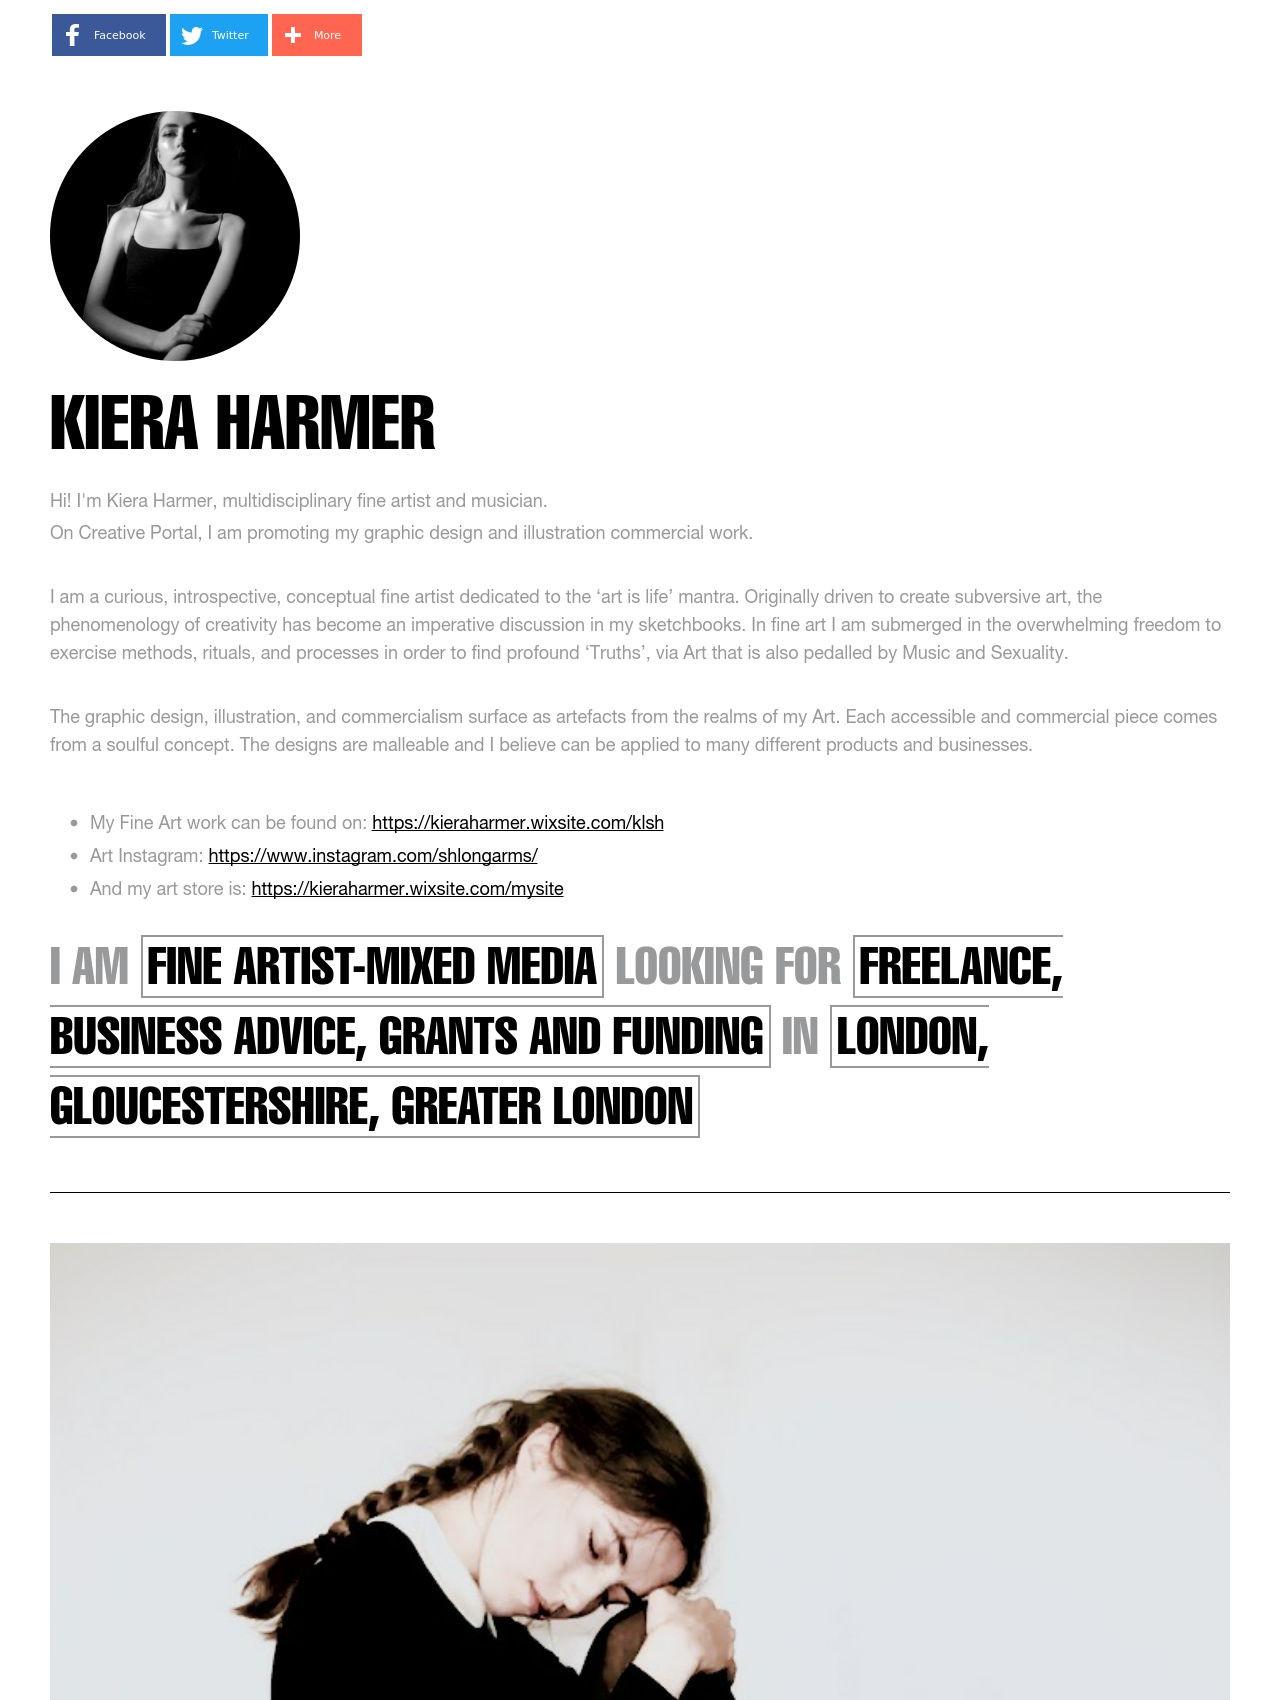 Kiera Harmer